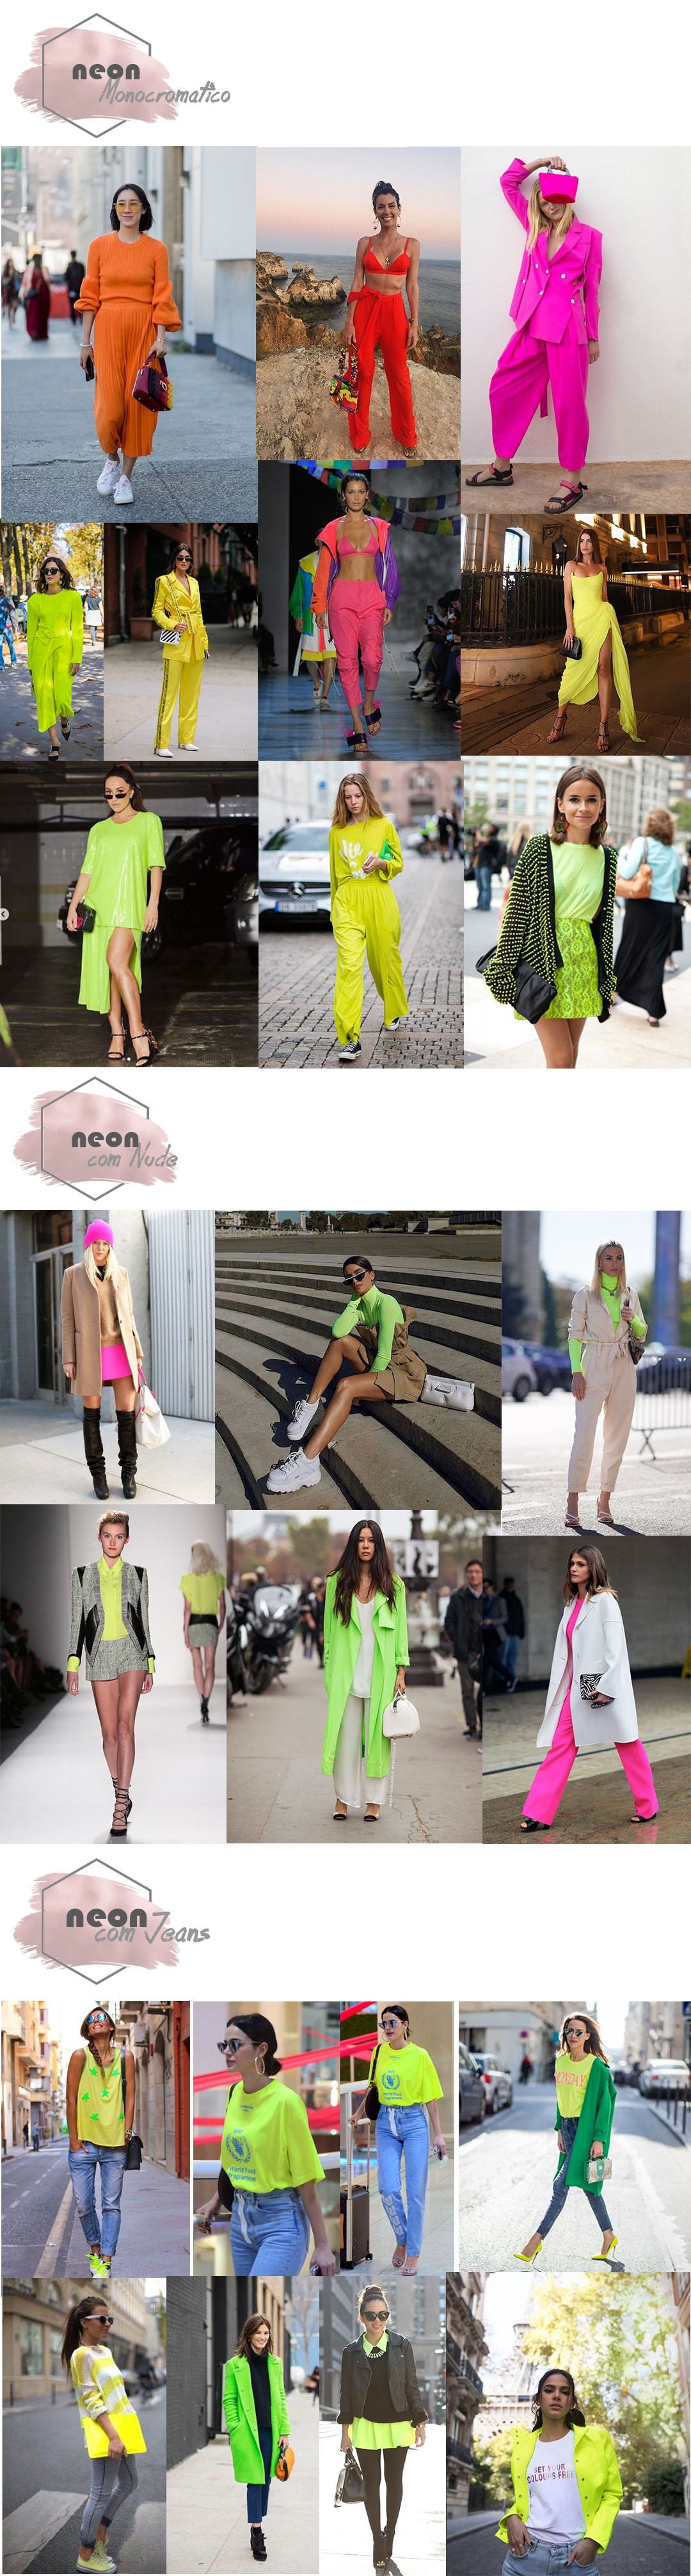 cdc89ce270 Alerta Neon  Trend é aposta para 2019 – Daiana Dick – Lifestyle